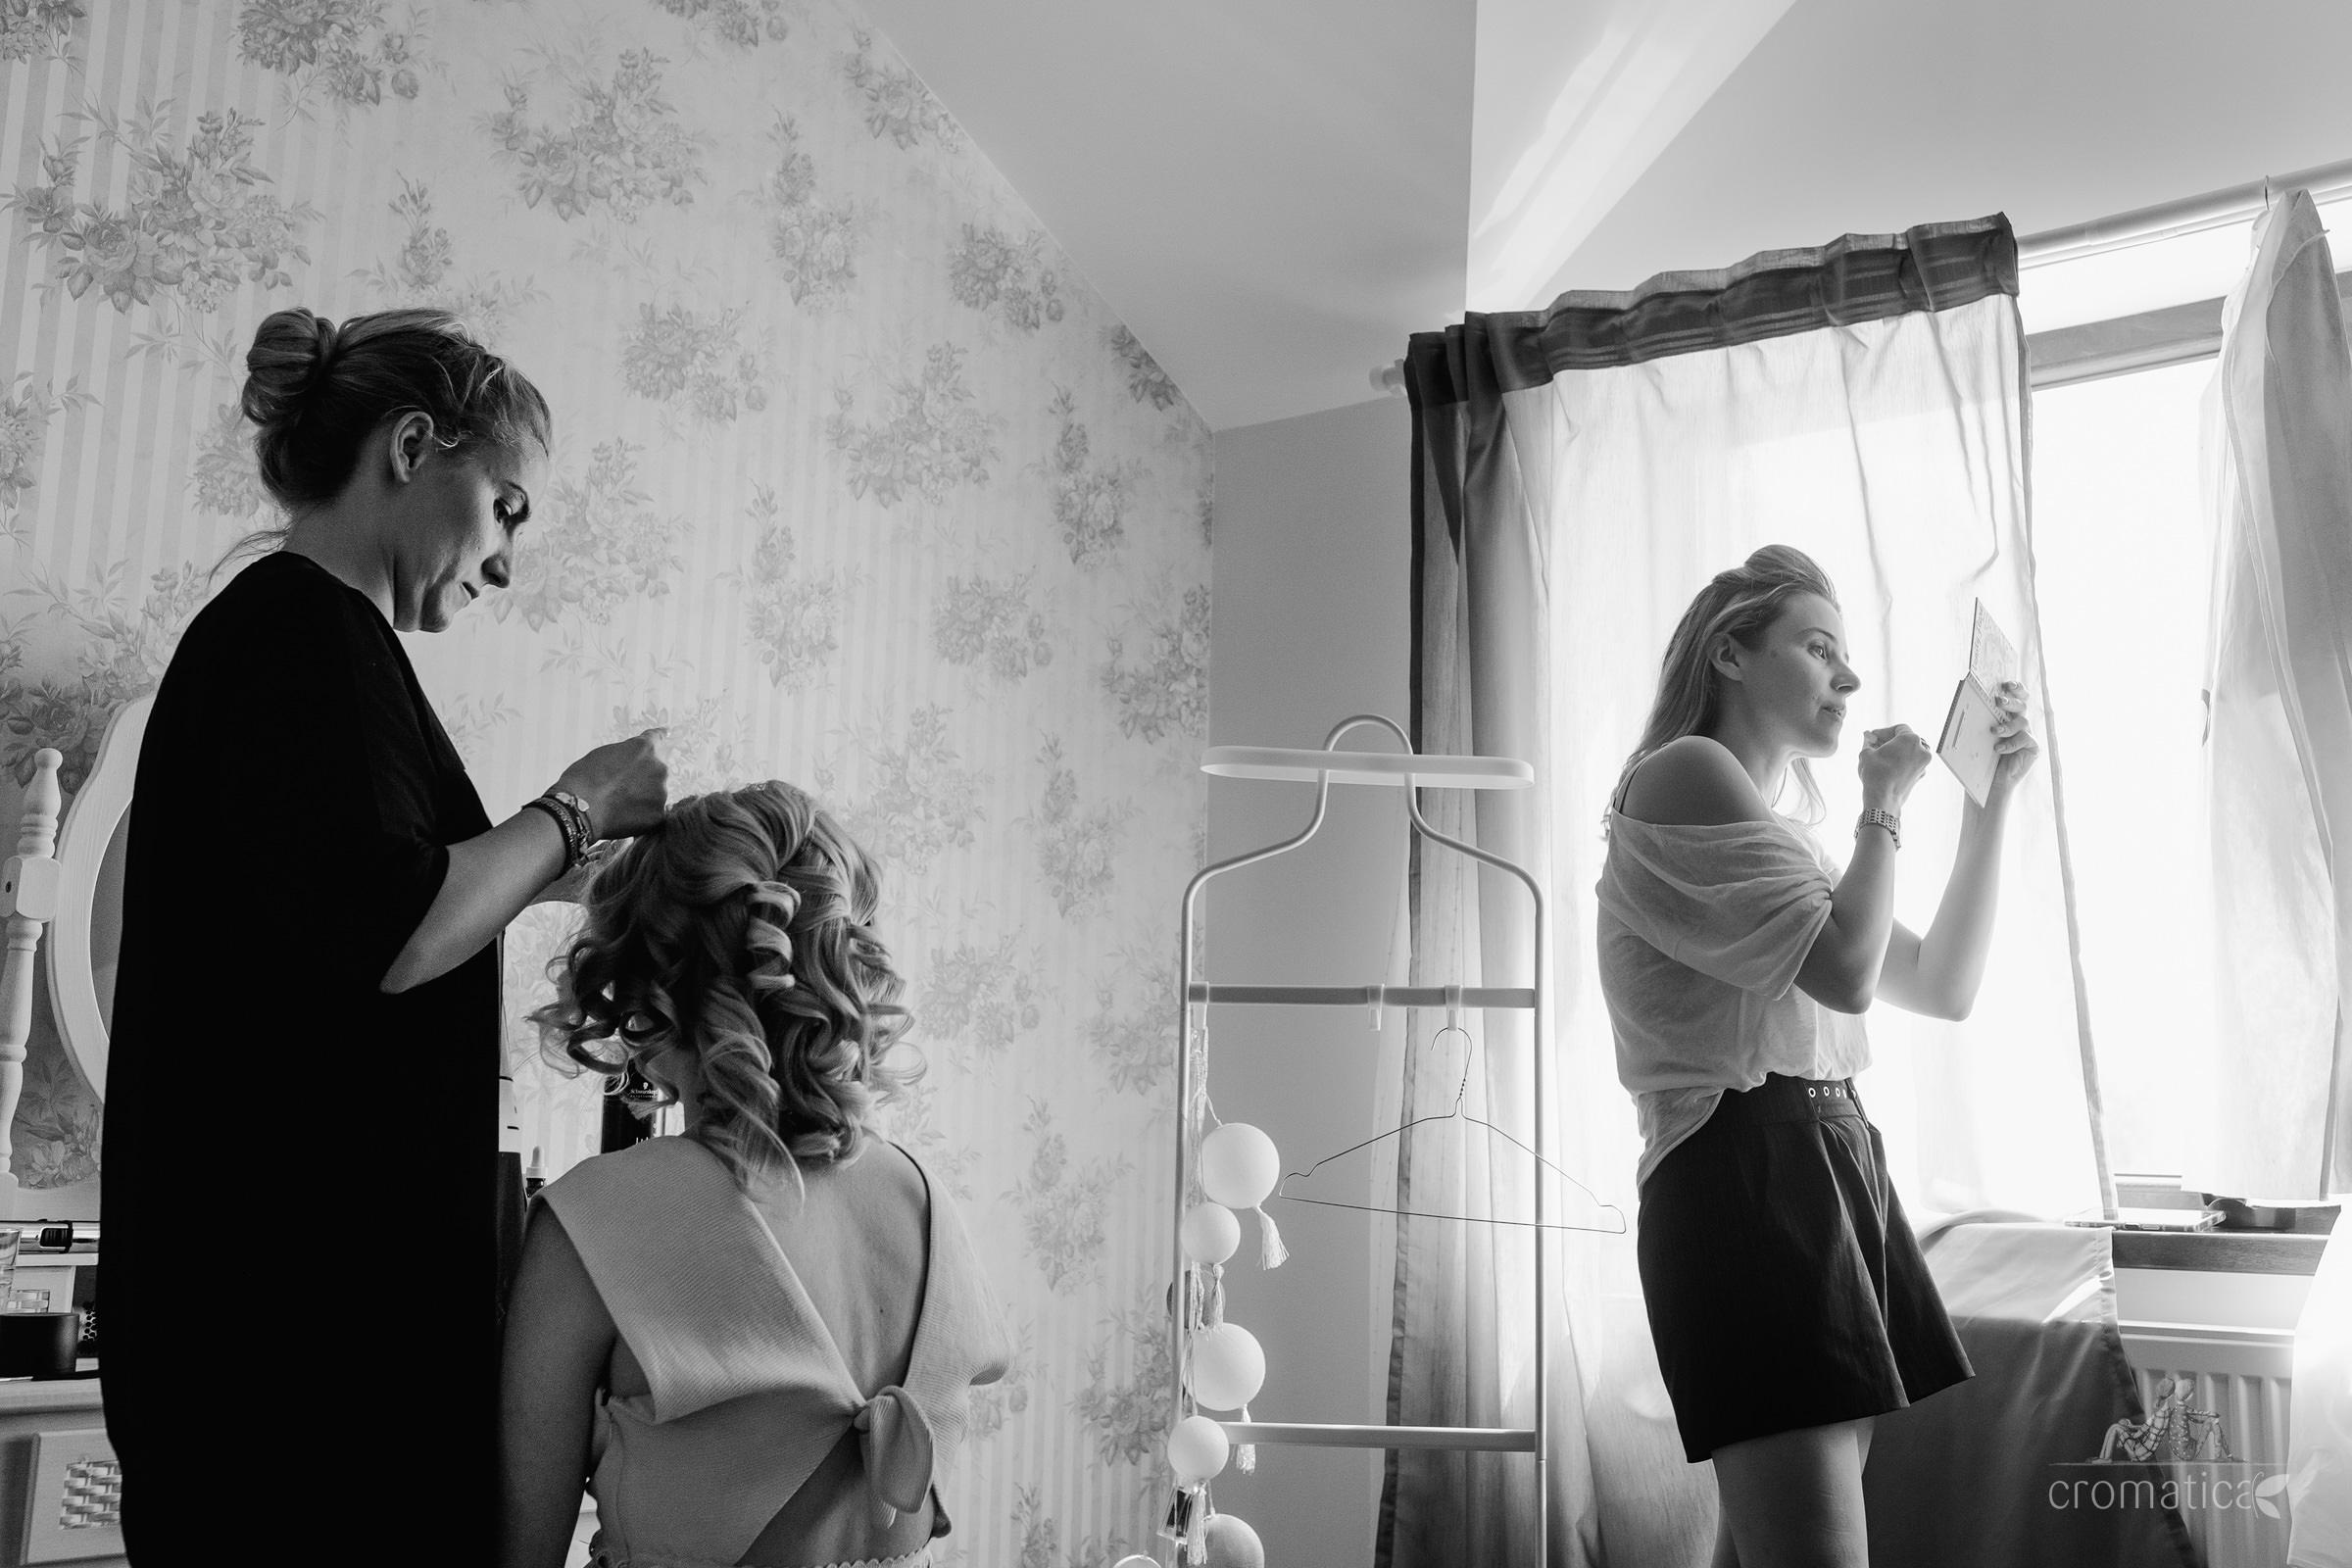 ana mihai fotografii nunta gradina lahovari 008